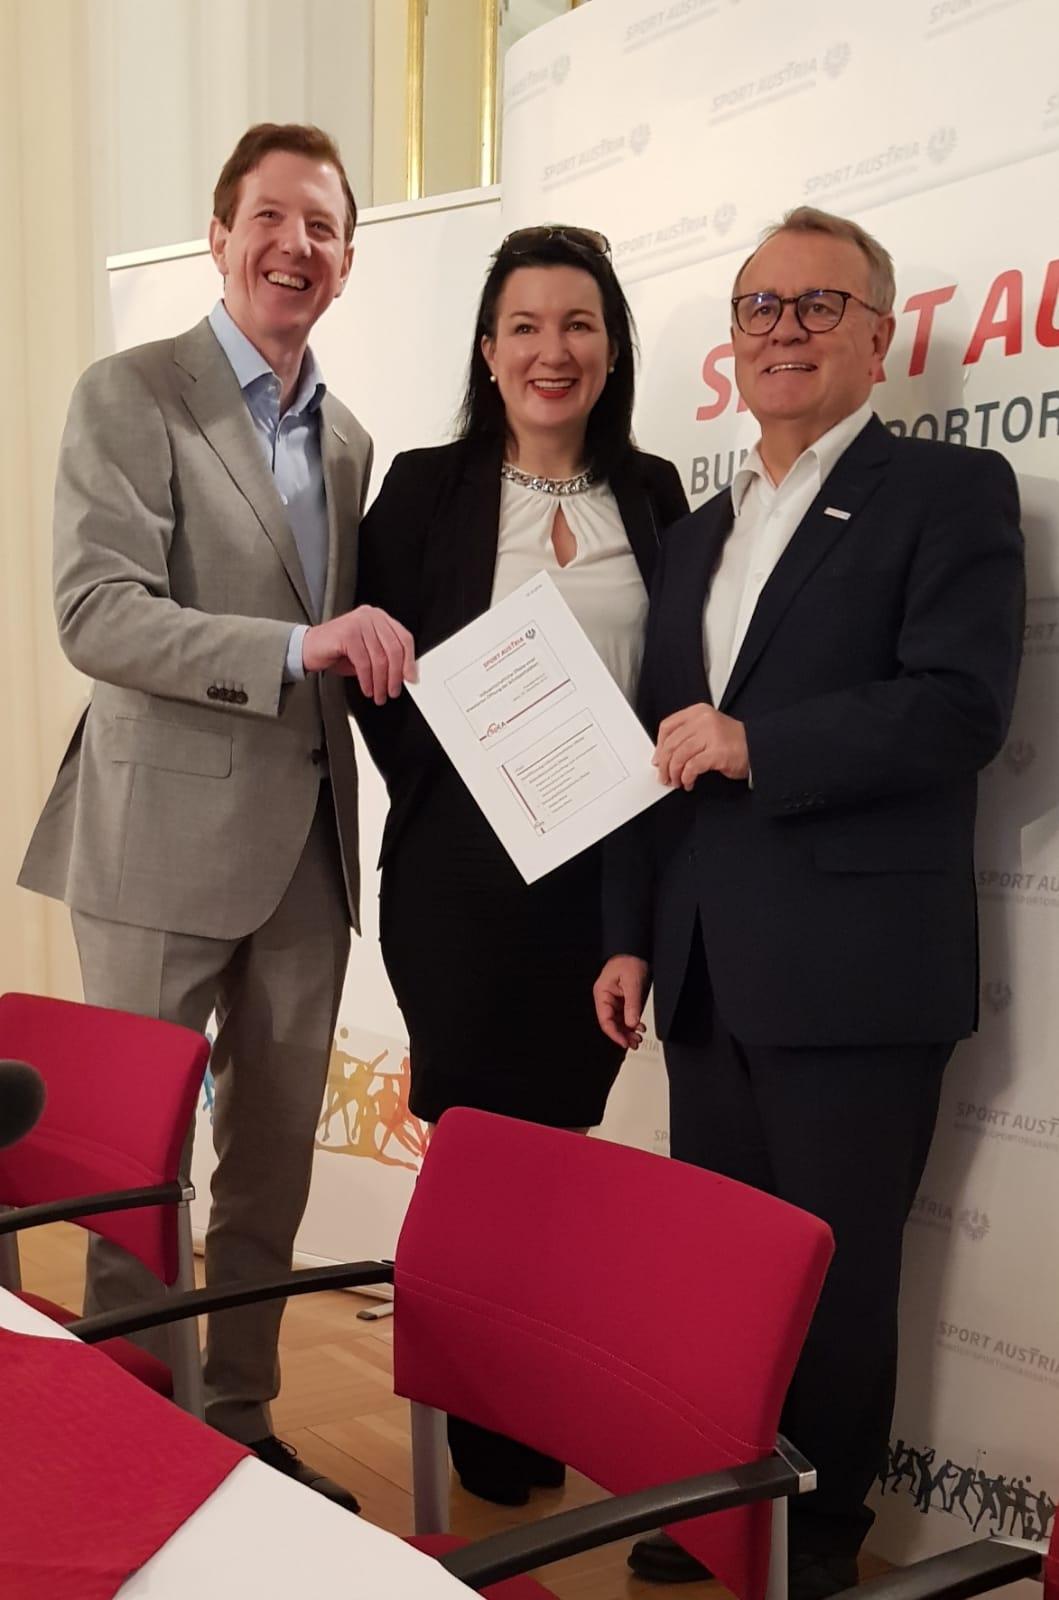 Peter McDonald, Anna Kleissner,Hans Niessl